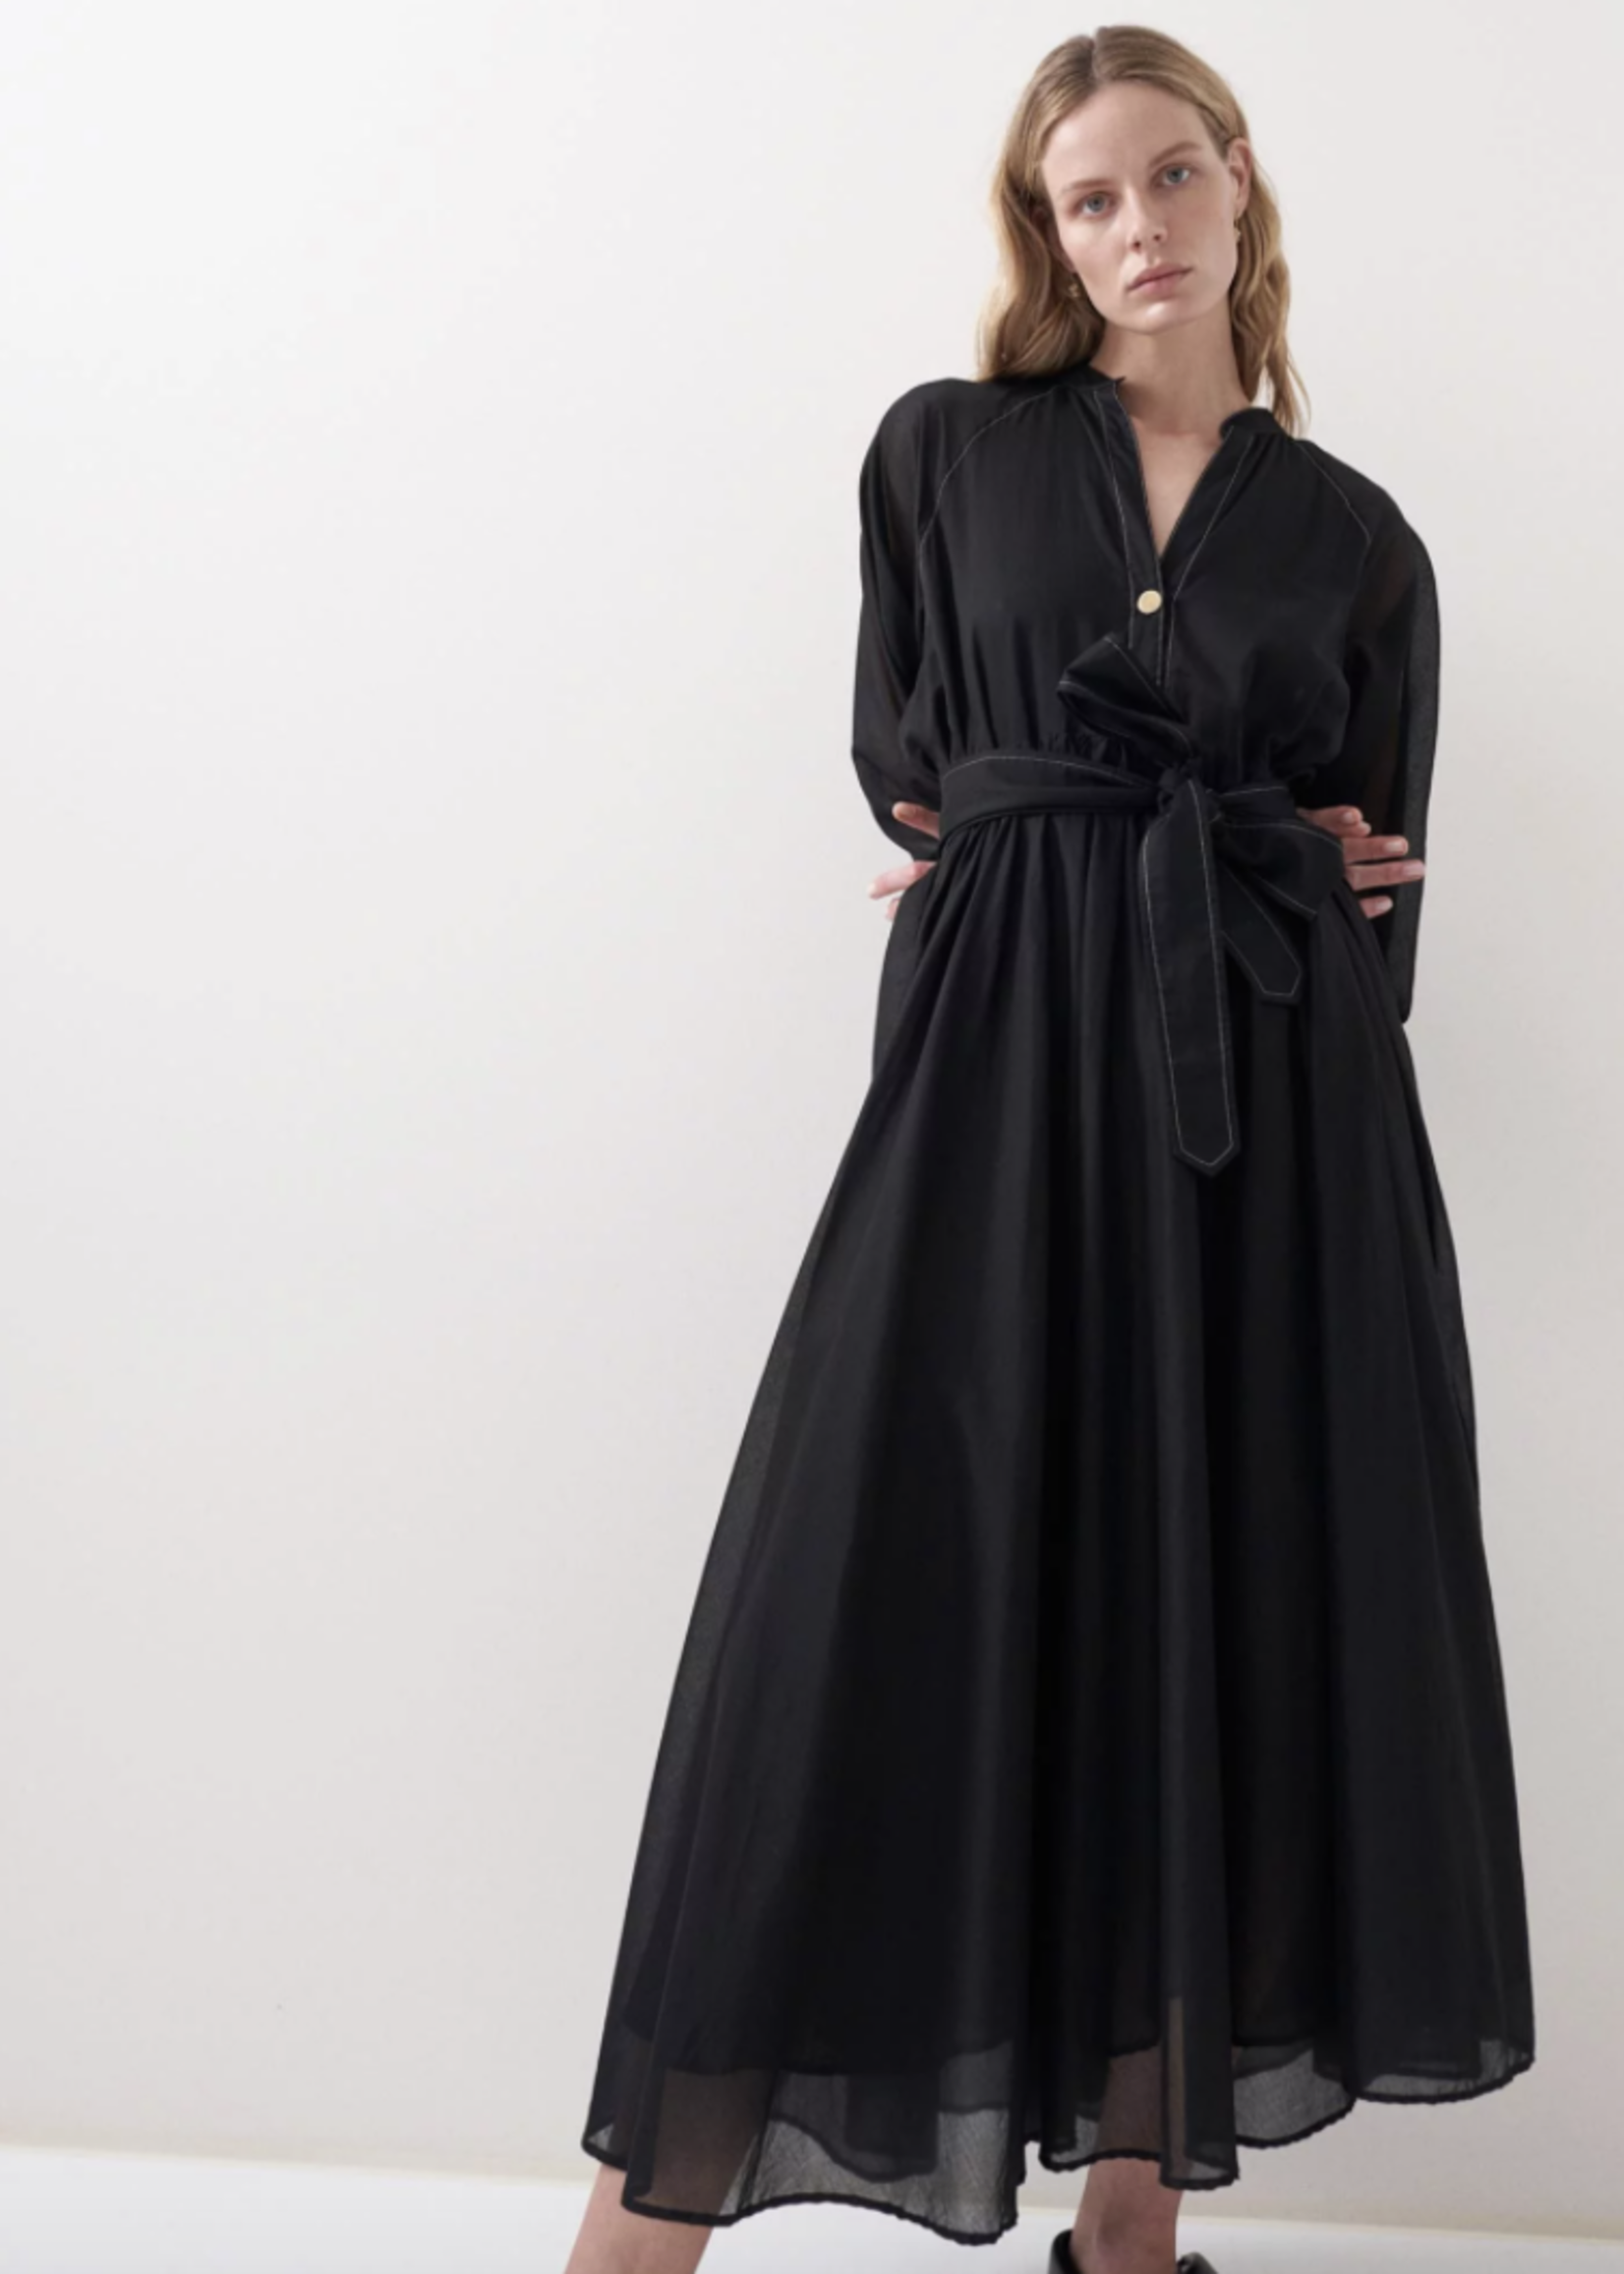 rikastudios rika studios athena dress black cotton s